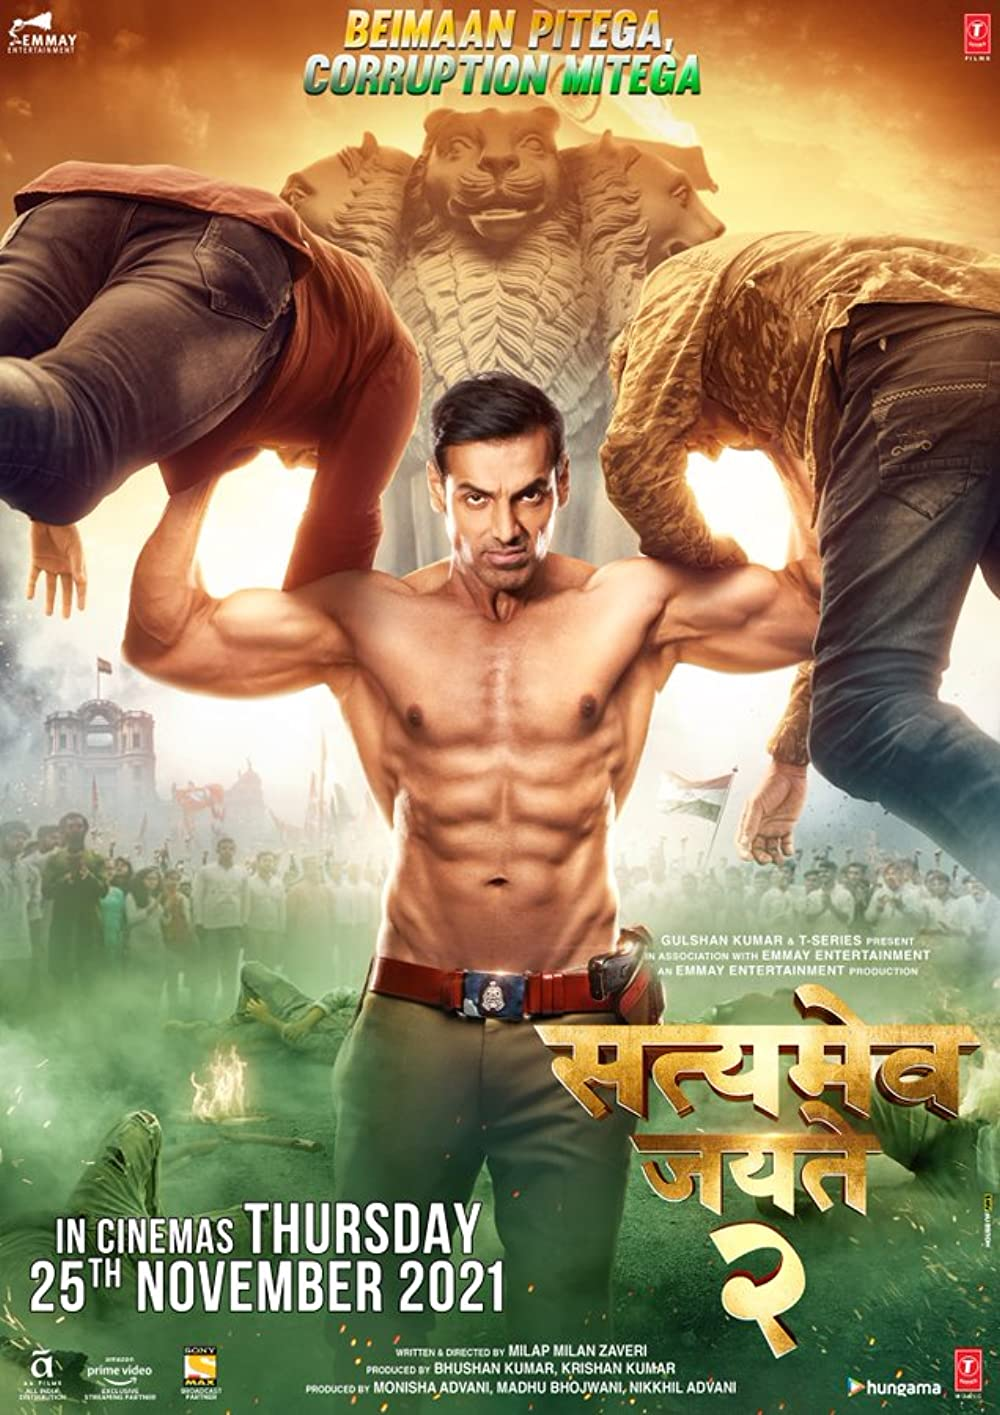 Satyameva Jayate 2 (2021) Hindi Movie 720p HDRip 1.2GB Download